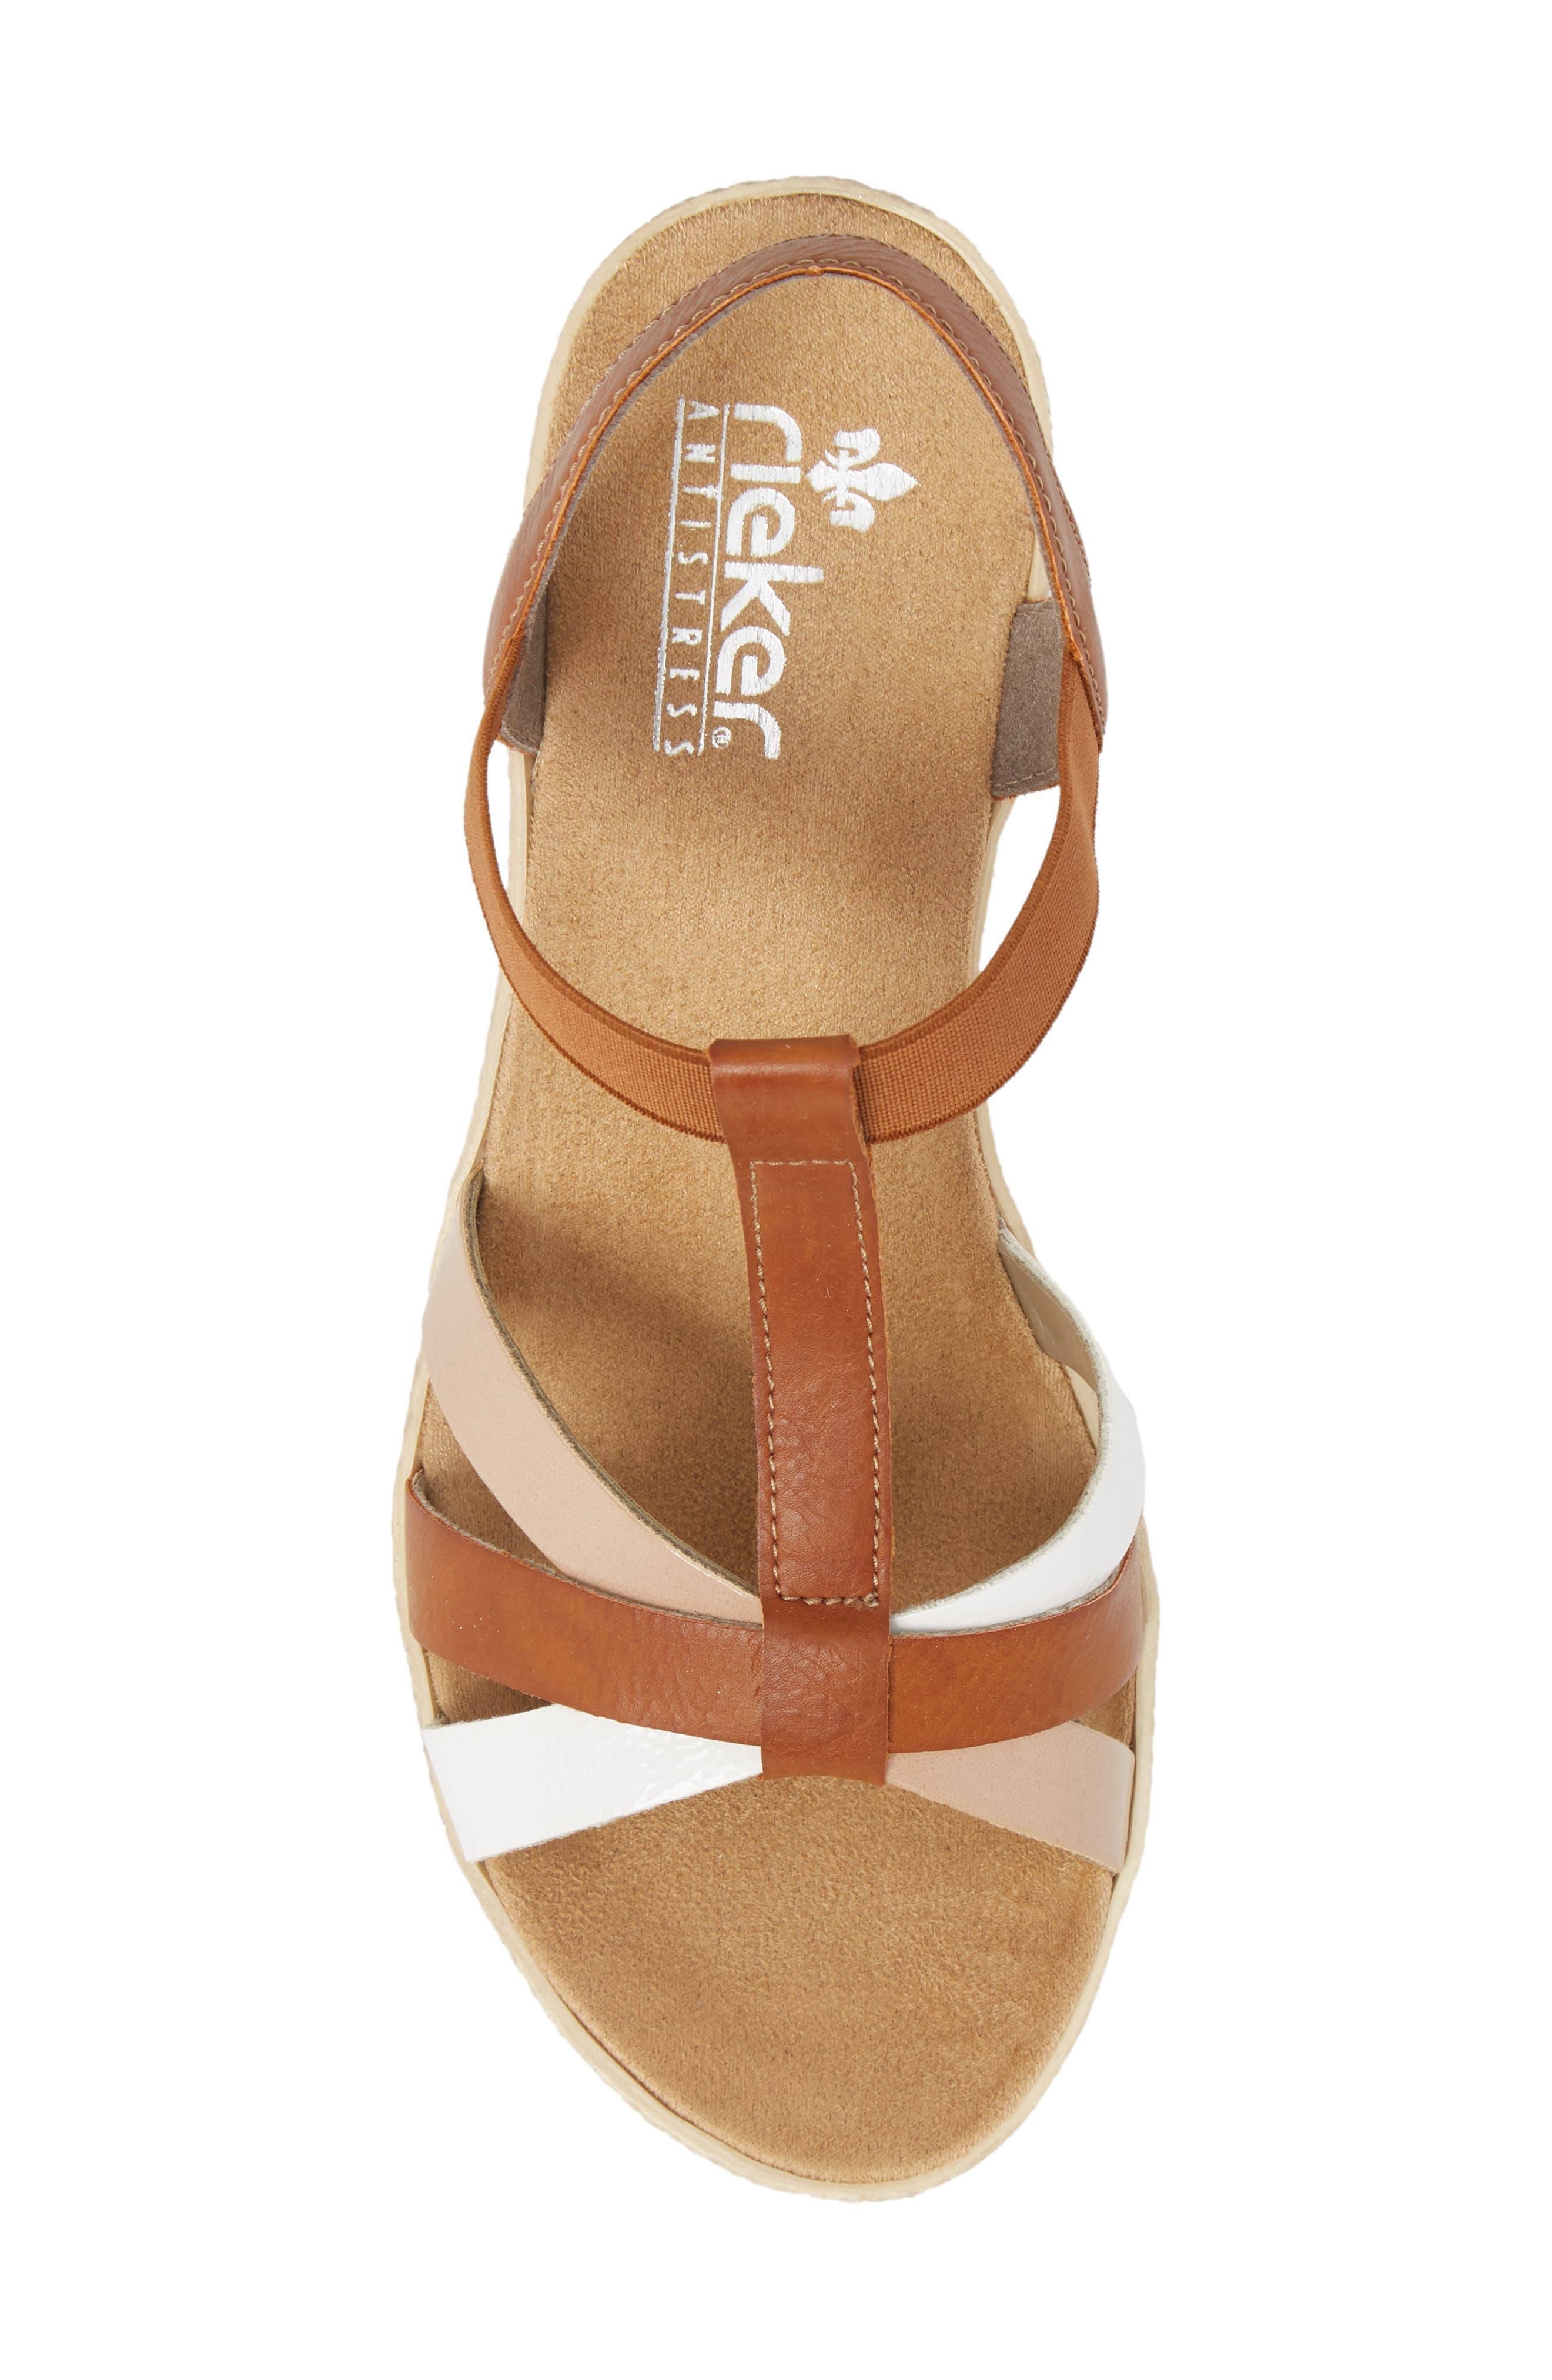 RIEKER ANTISTRESS,                             Fanni 95 Espadrille Wedge Sandal,                             Alternate thumbnail 5, color,                             BIANCO/ CAYENNE